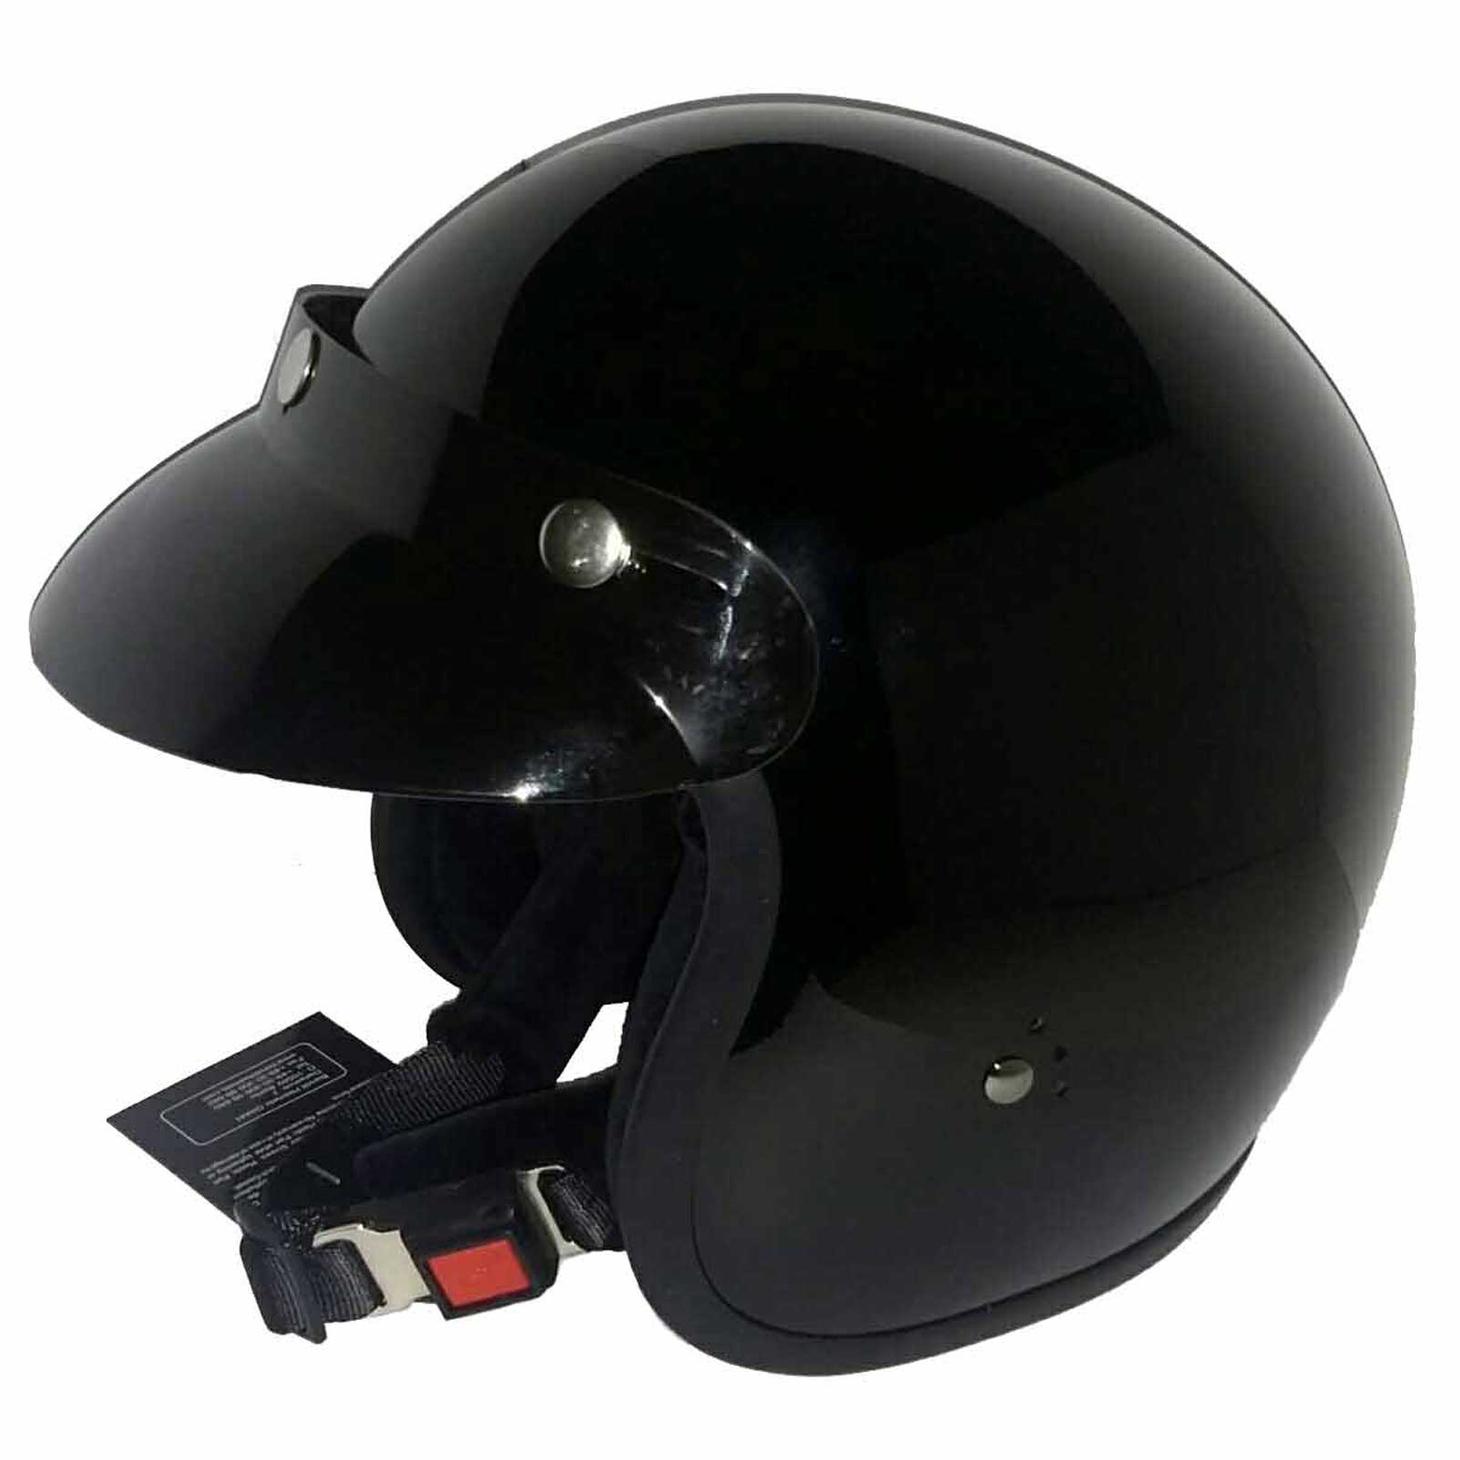 Bandit Jet Helmet - Glossy Black Motorcycle Open Face Helmet – Picture 2